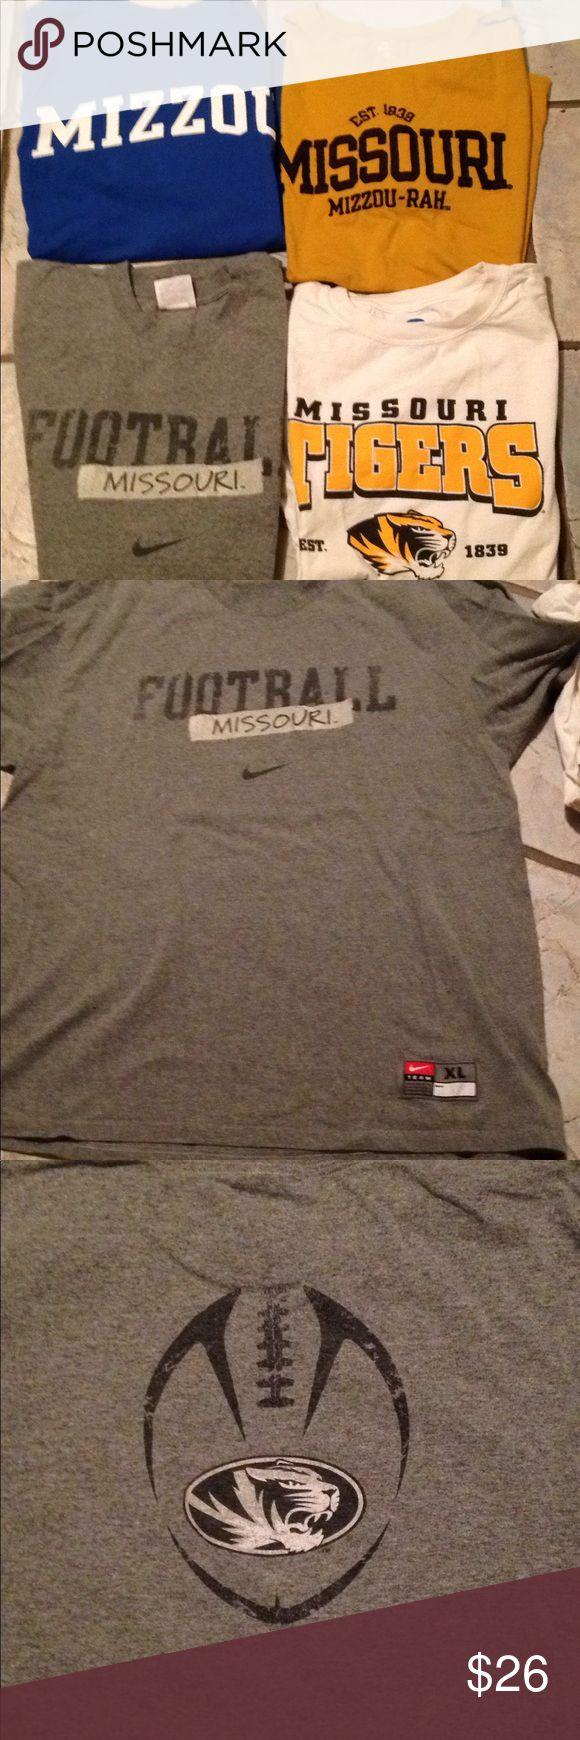 MIZZOU-RAH tshirts men's size XL short sleeve Four University of Missouri men's t-shirts in great condition. Shirts Tees - Short Sleeve